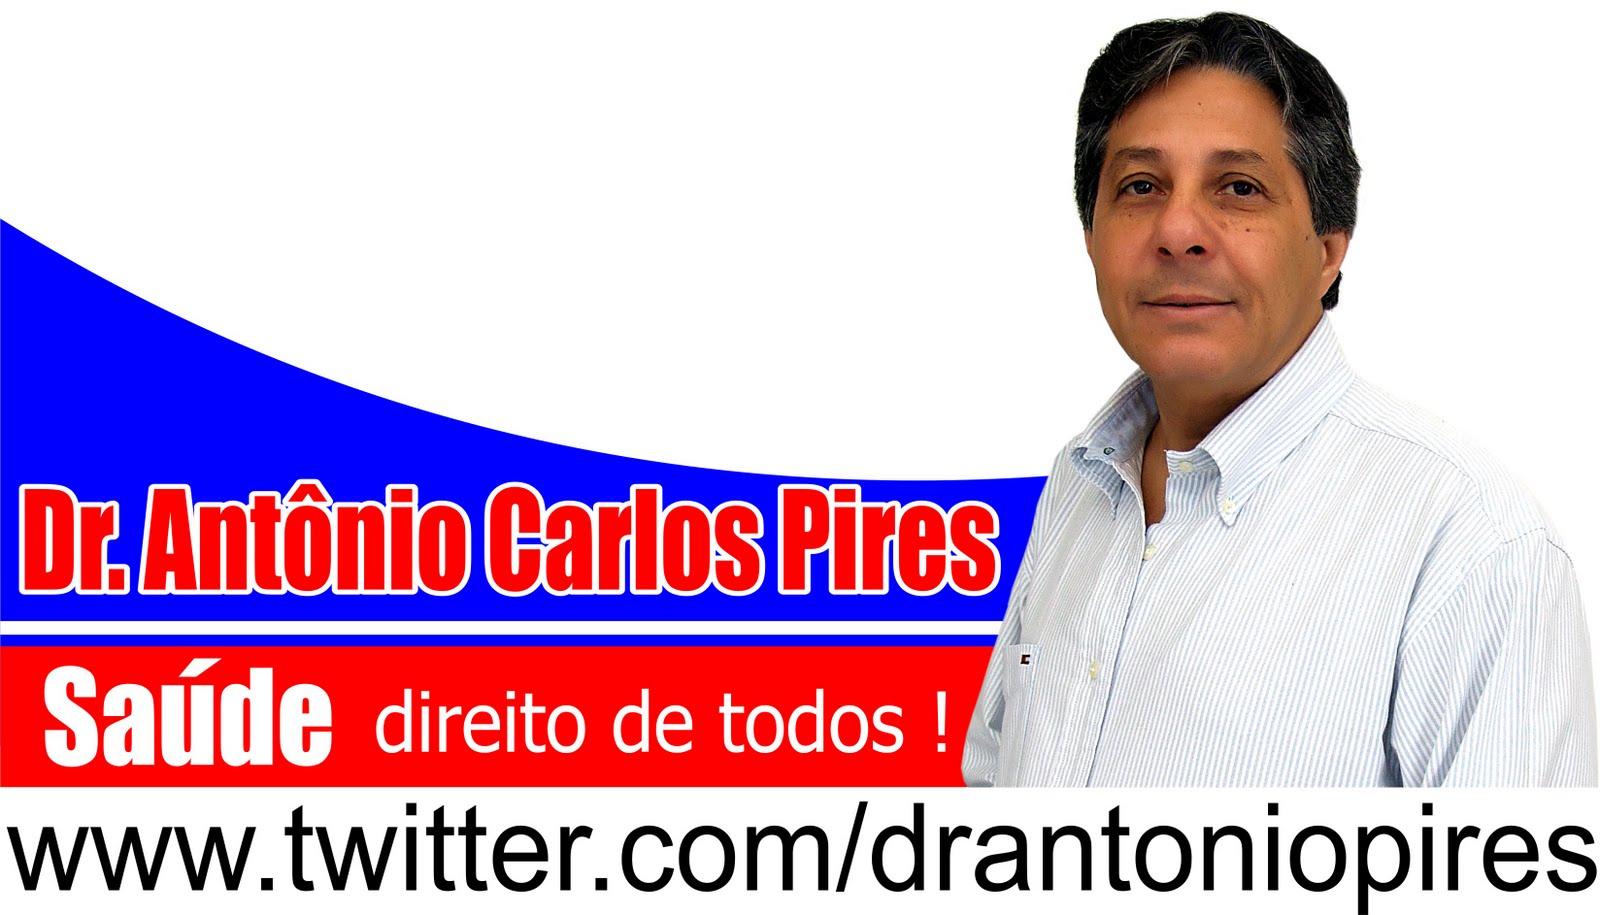 Trajetória - Dr. Antônio Carlos Pires